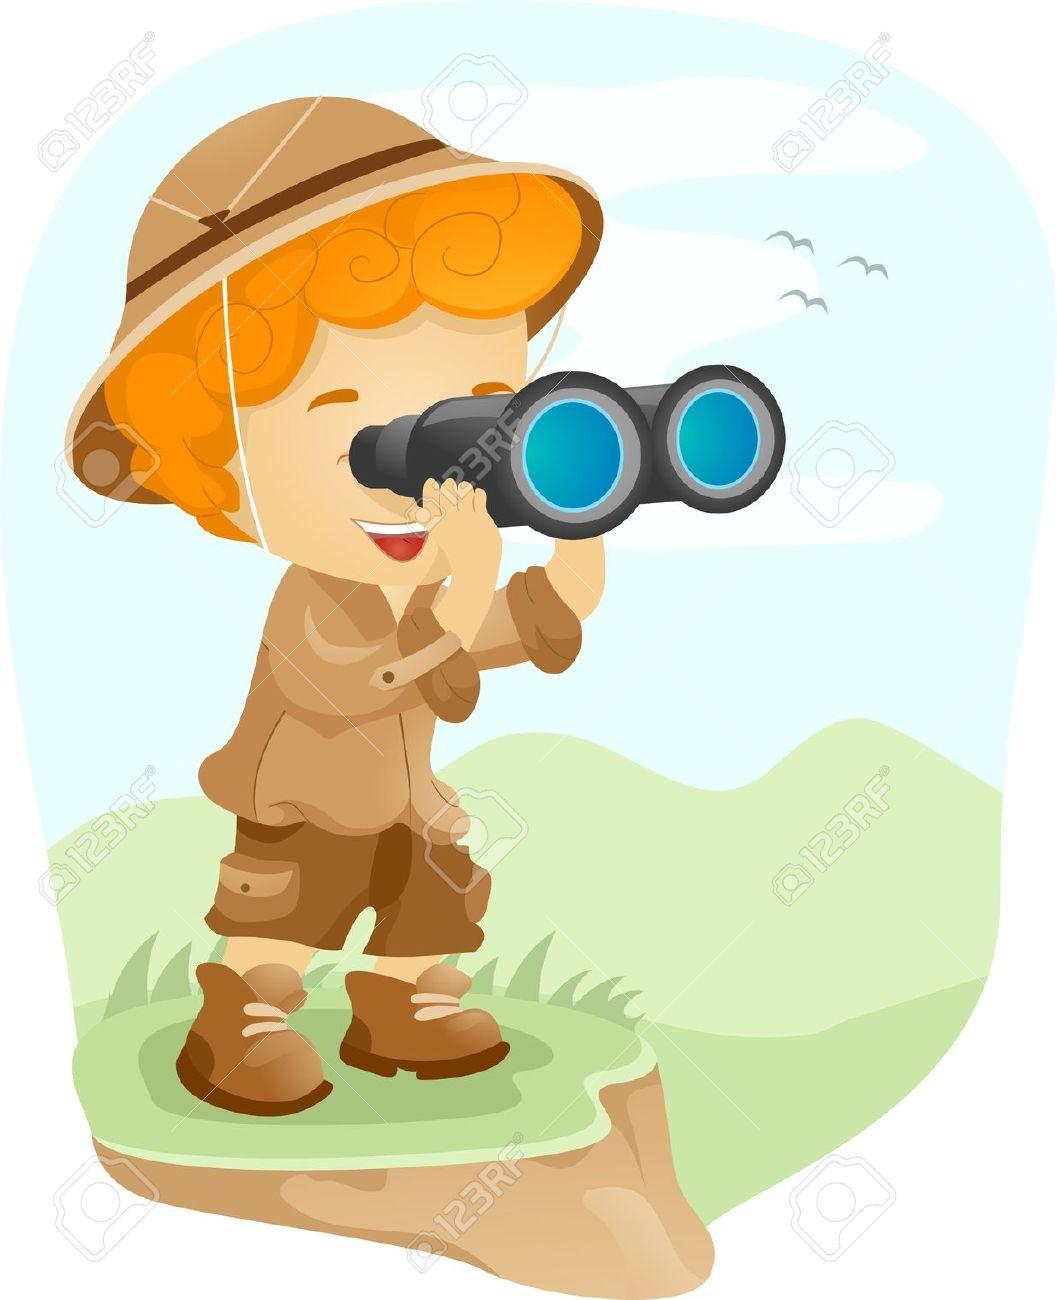 Adventure clipart kid adventure Of Royalty  Travel Illustration